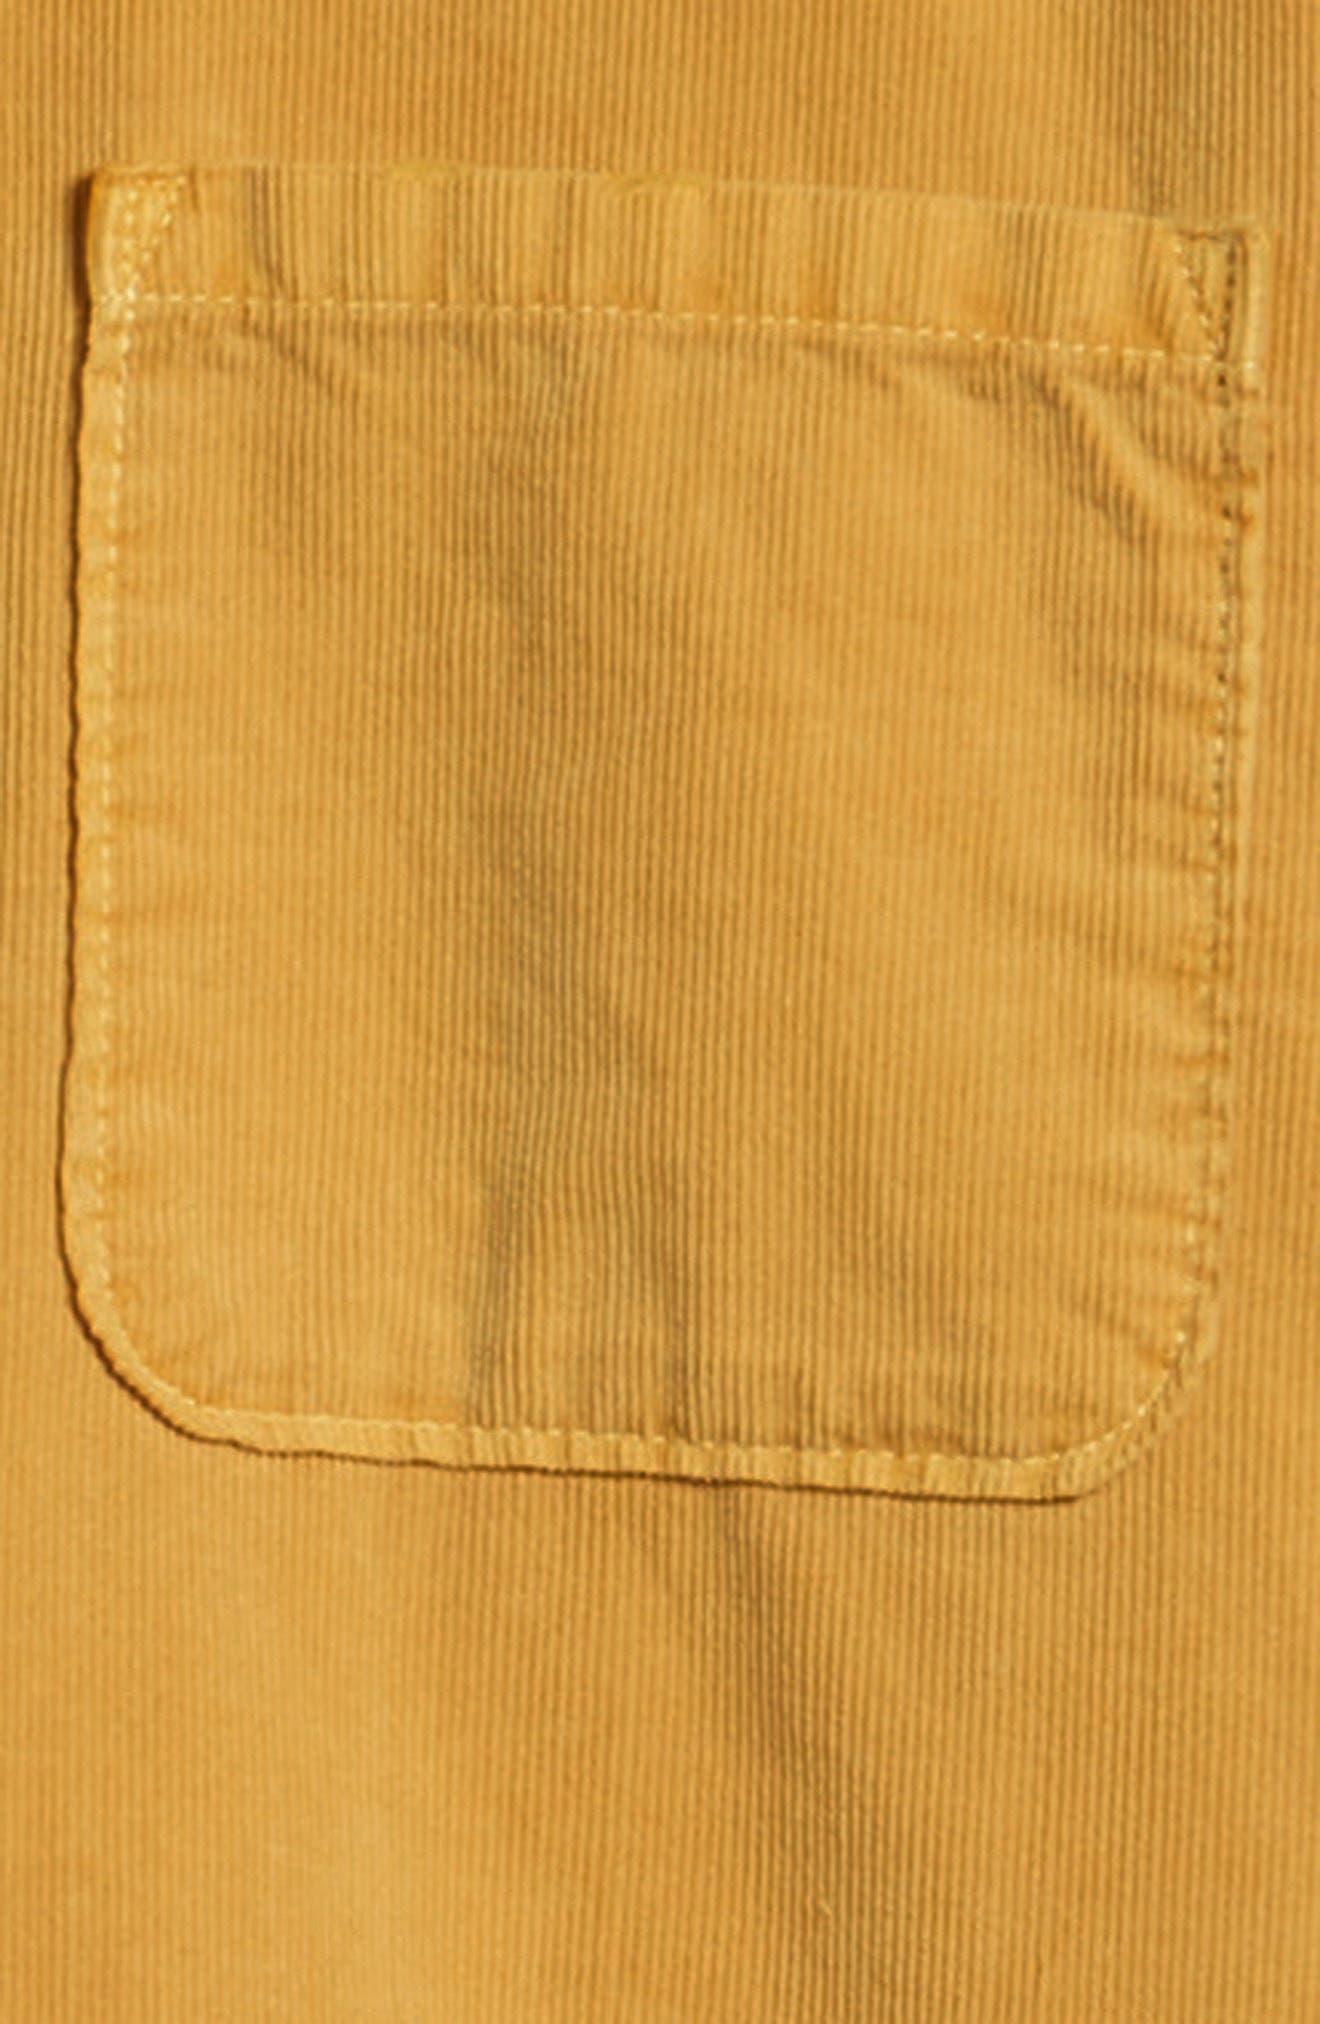 Slim Fit Corduroy Shirt,                             Alternate thumbnail 6, color,                             FADED GOLDEN GLOW